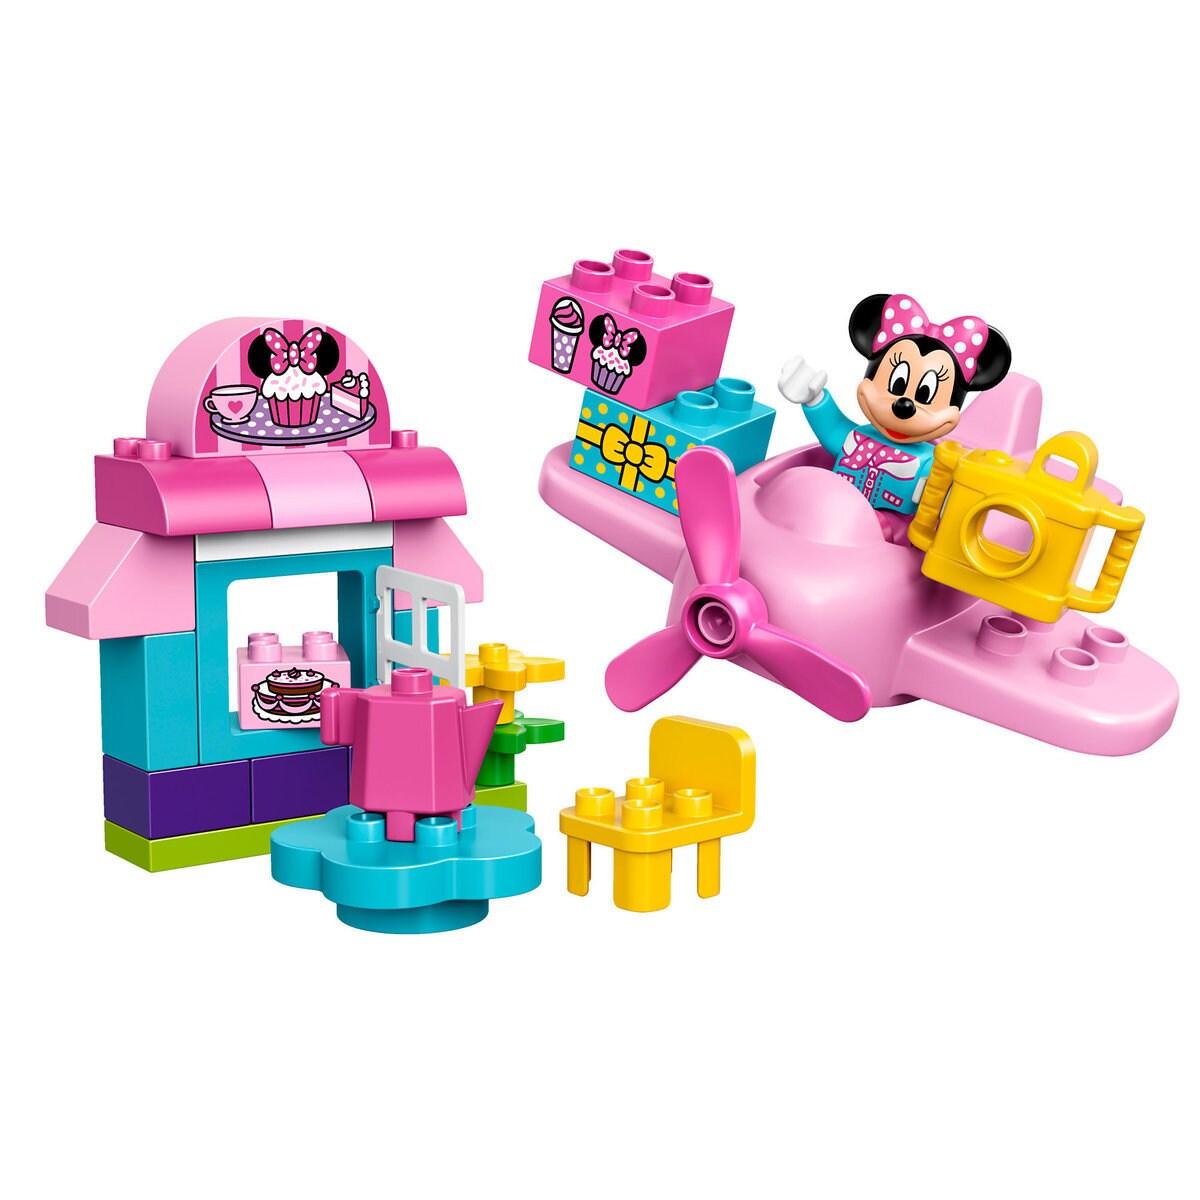 Minnie Mouse Minnies Café Lego Duplo Playset Shopdisney